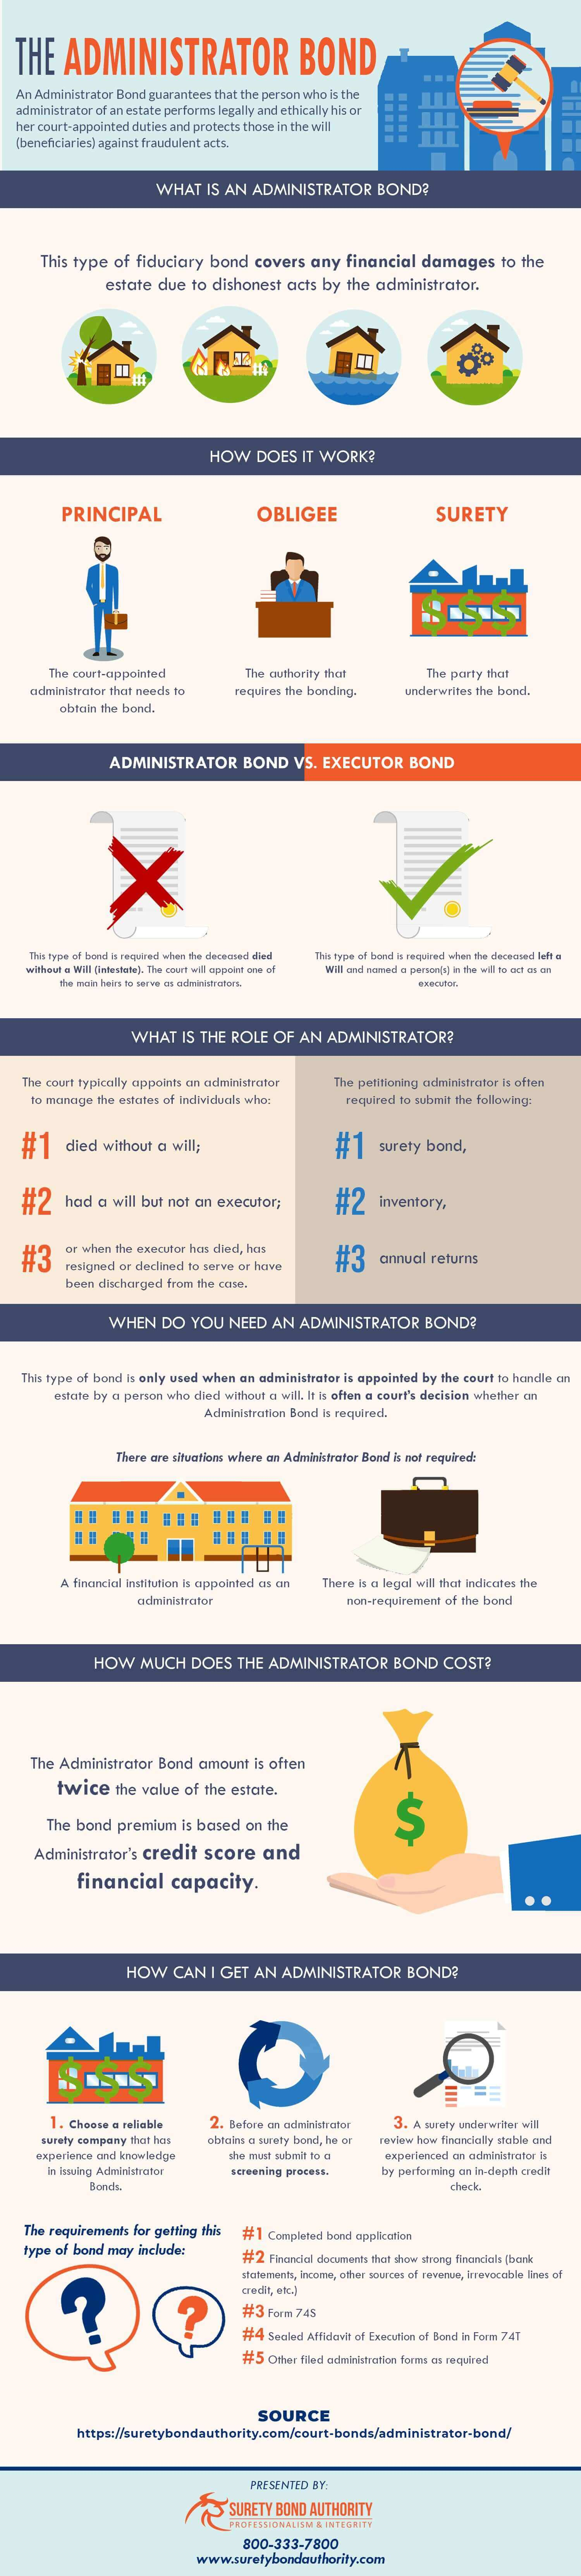 Administrator Bond Infographic